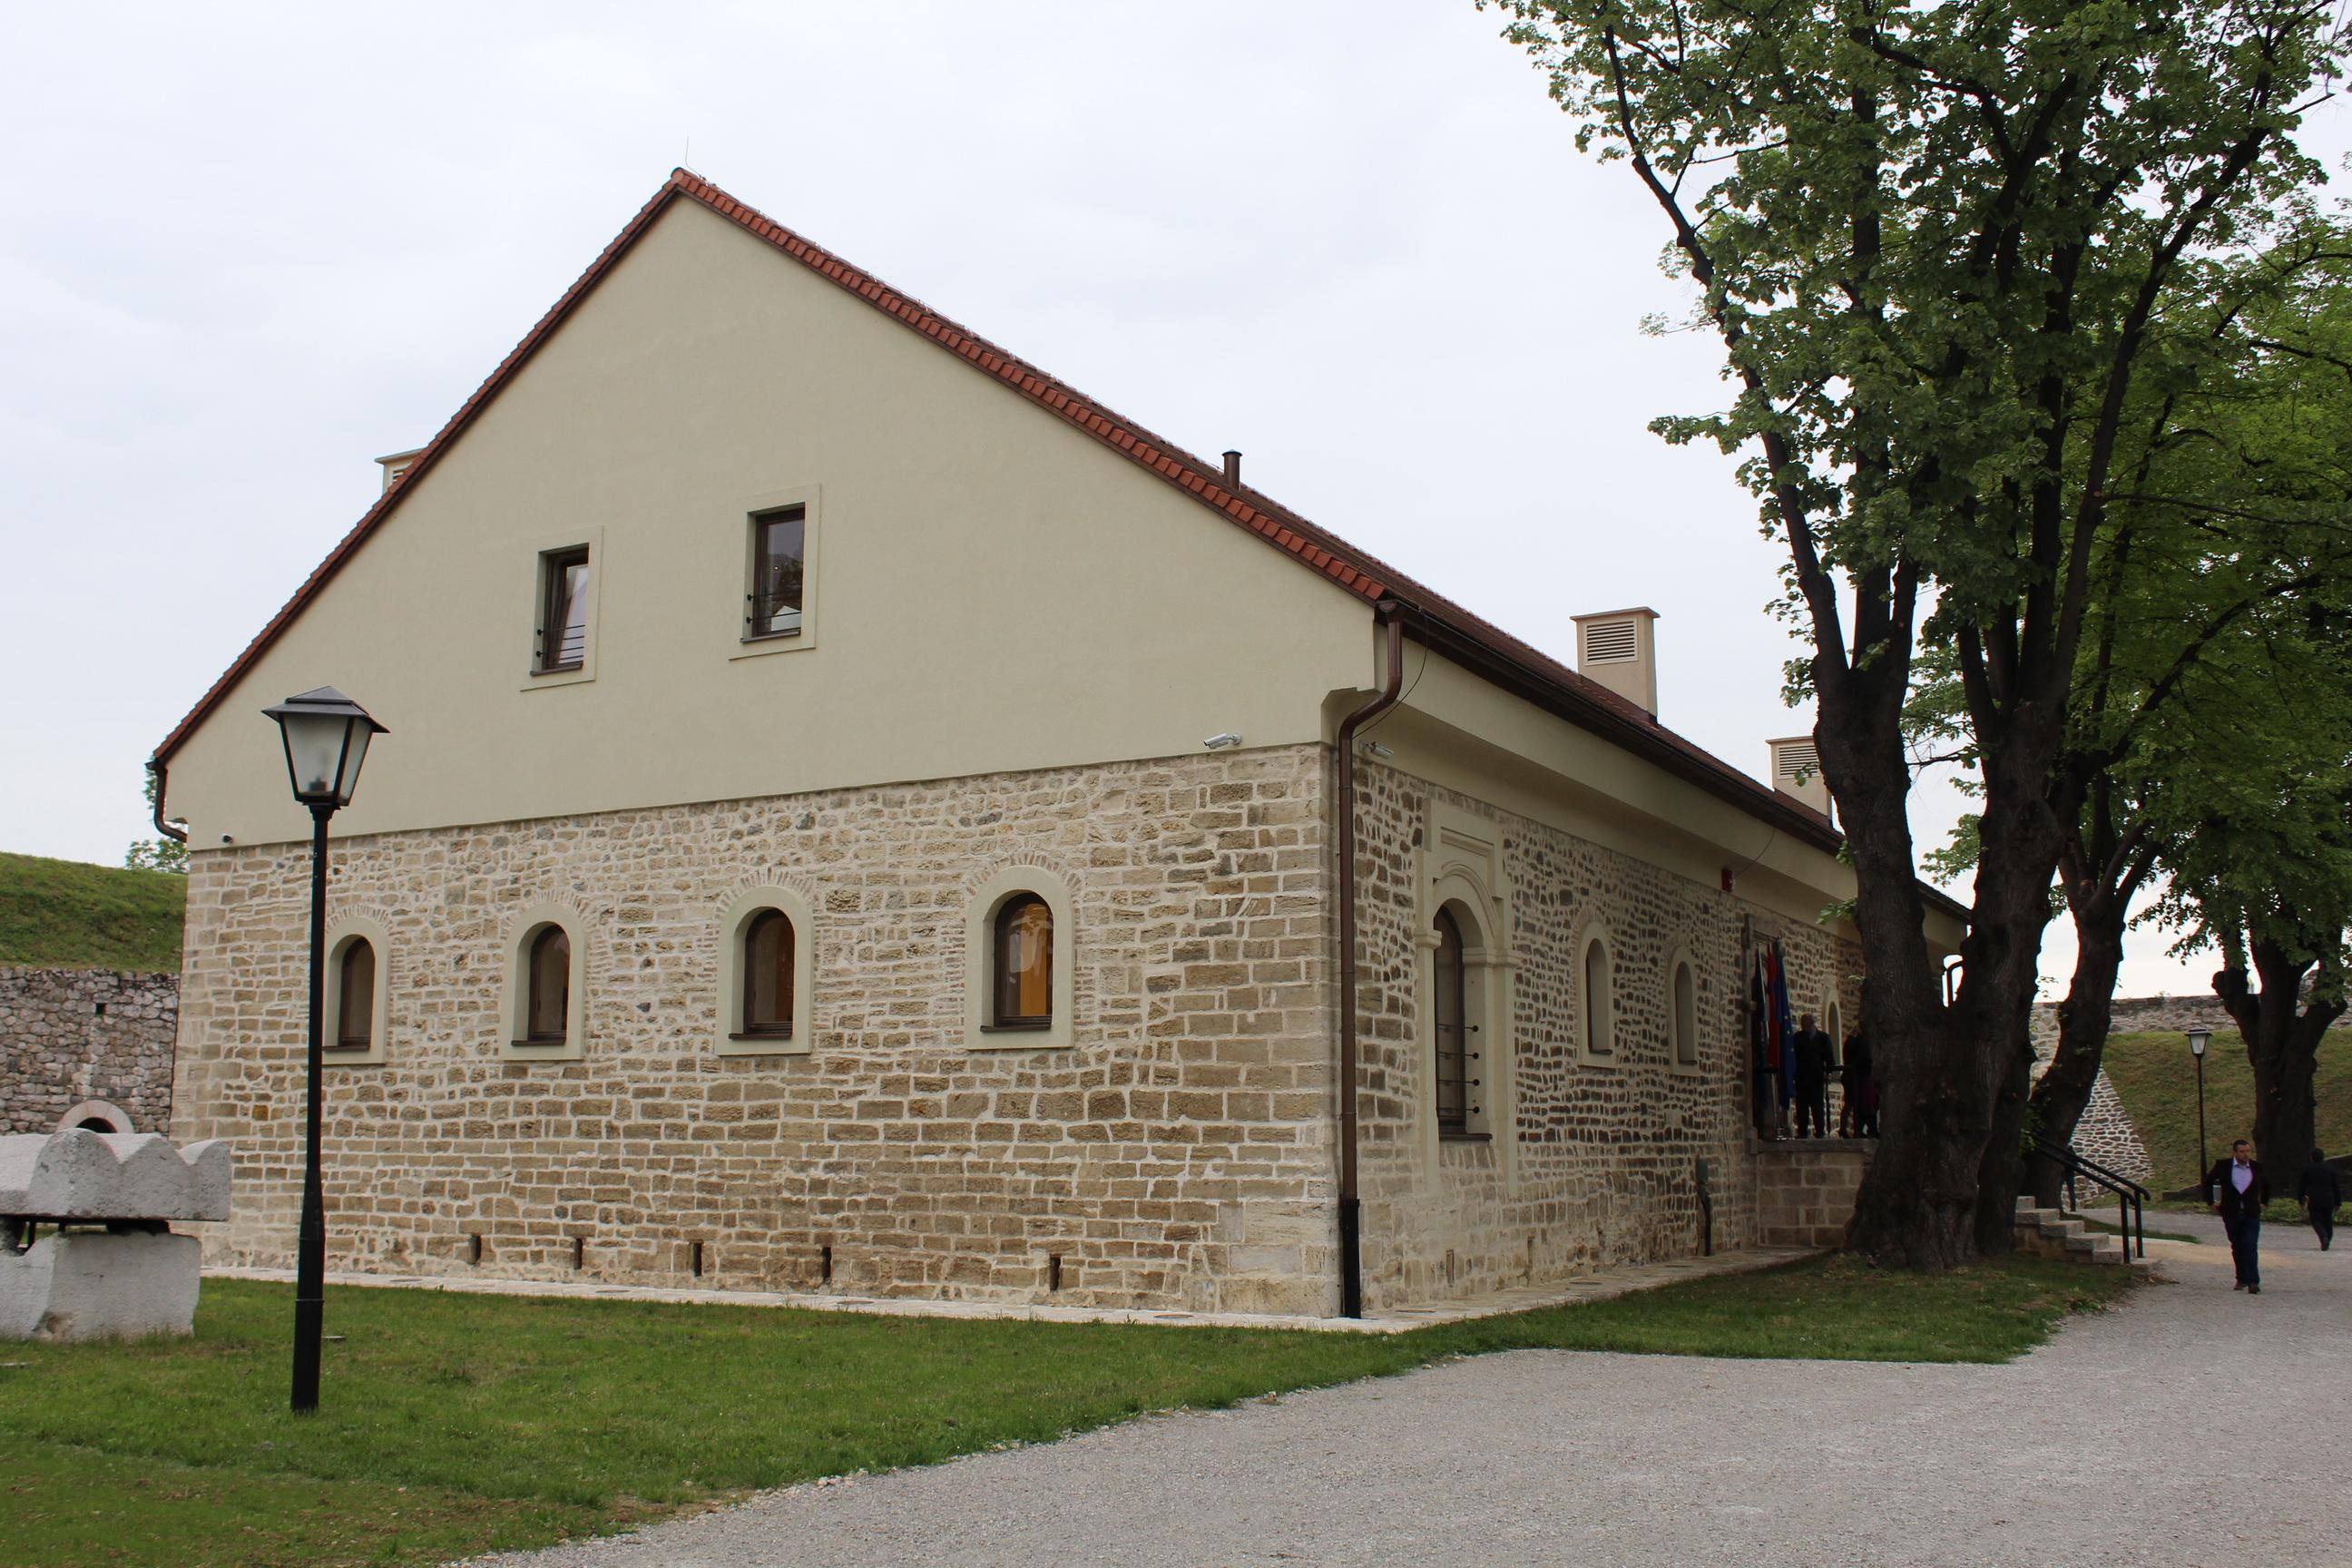 Banja Luka symbol reconstructed